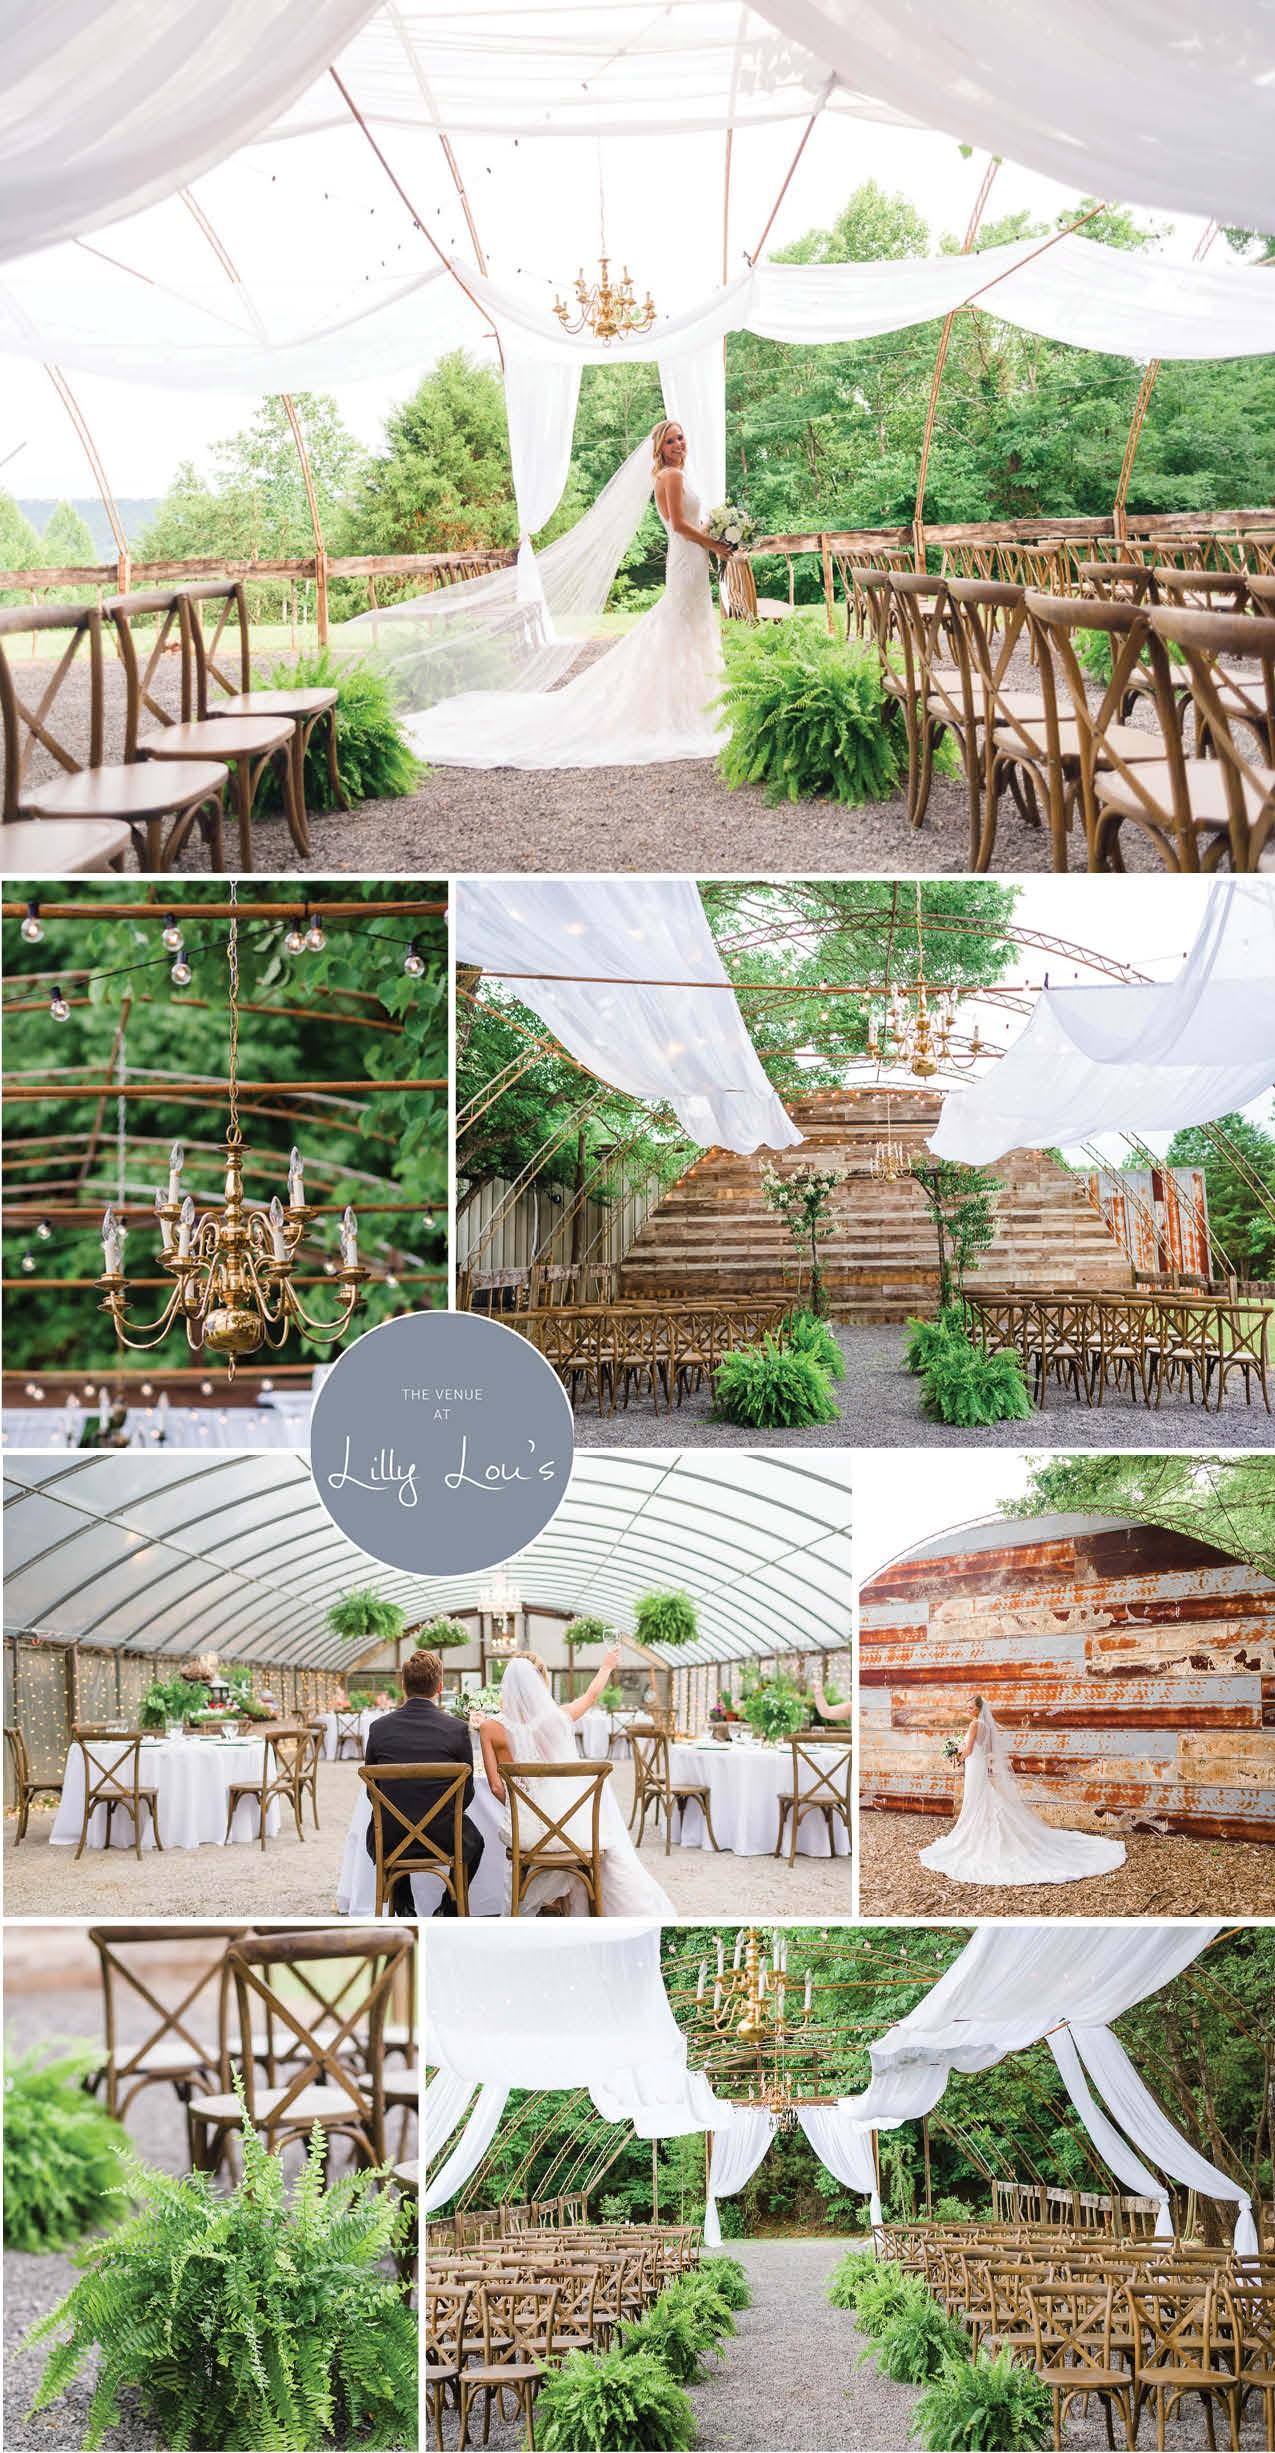 The Venue At Lilly Lou S Wedding Venue Trenton Ga Nelya Greenhouse Wedding Outdoor Wedding Garden Wedding Inspiration